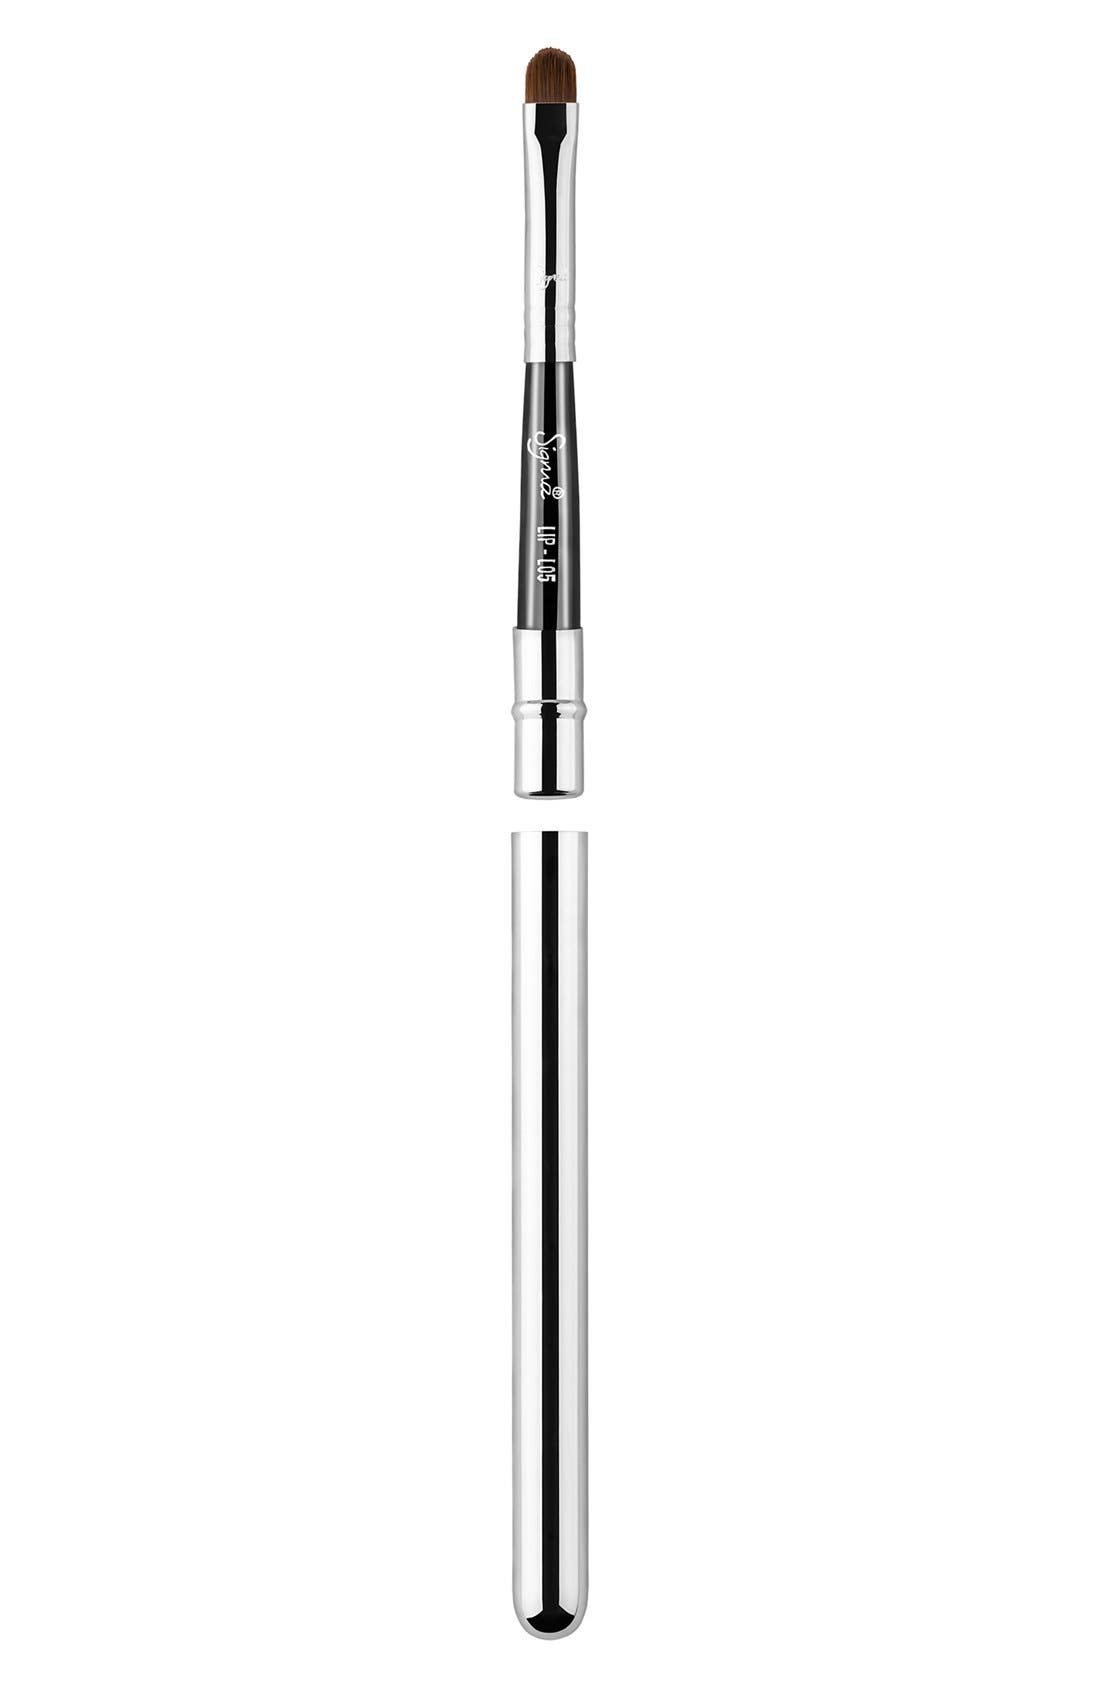 Sigma Beauty L05 Lip Brush